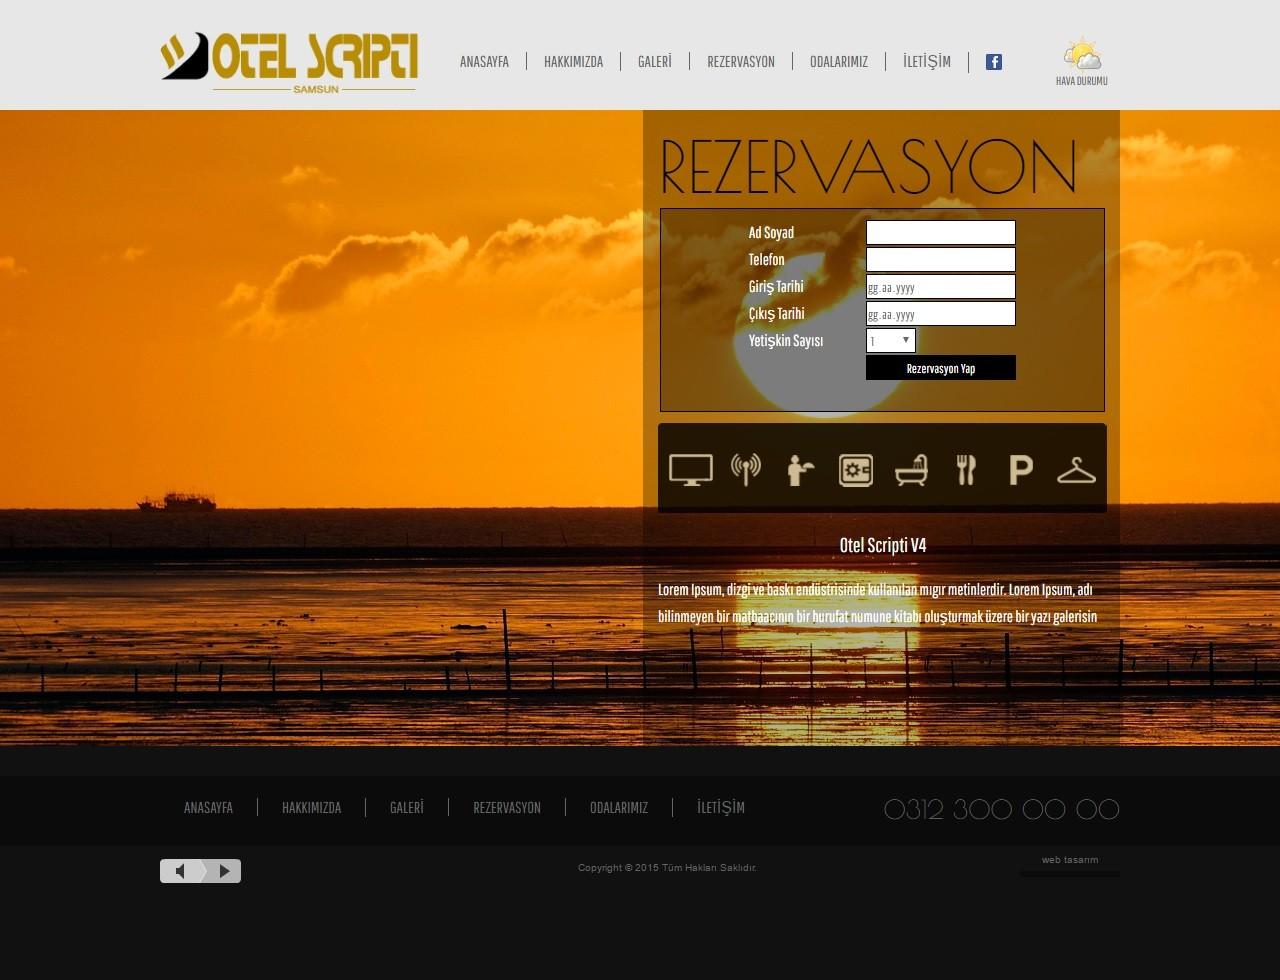 Ücretsiz PHP Hotel Scripti